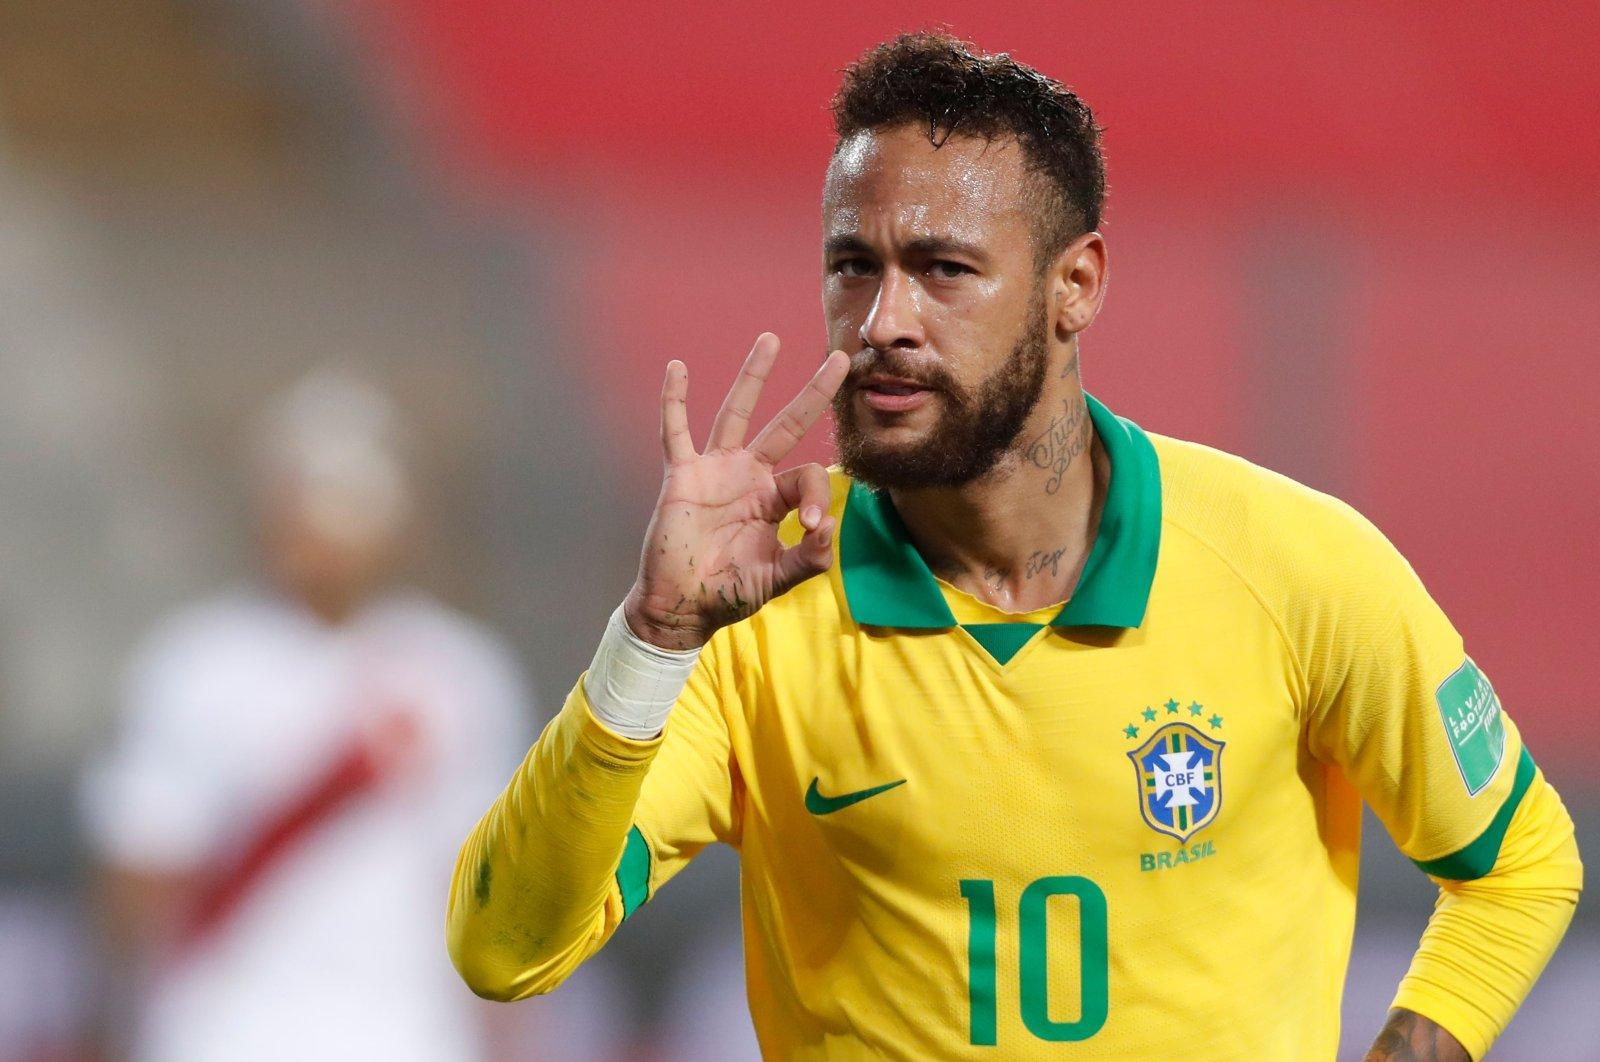 Neymar celebrates after scoring against Peru, in Lima, Peru, Oct. 13, 2020. (AFP Photo)